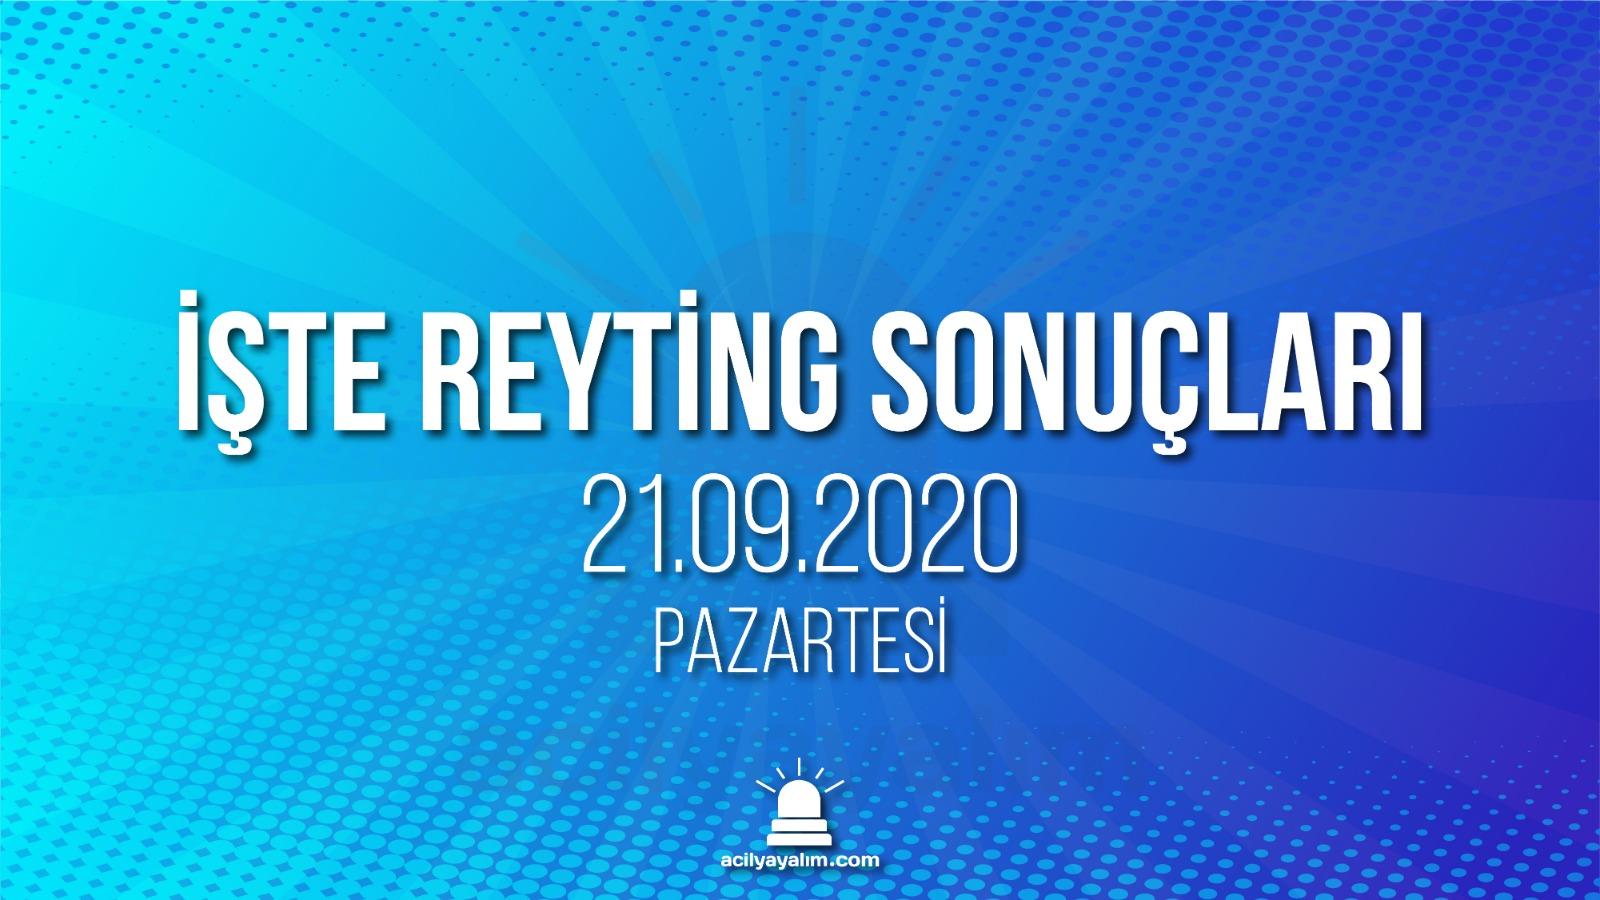 22 Eylül 2020 Salı reyting sonuçları